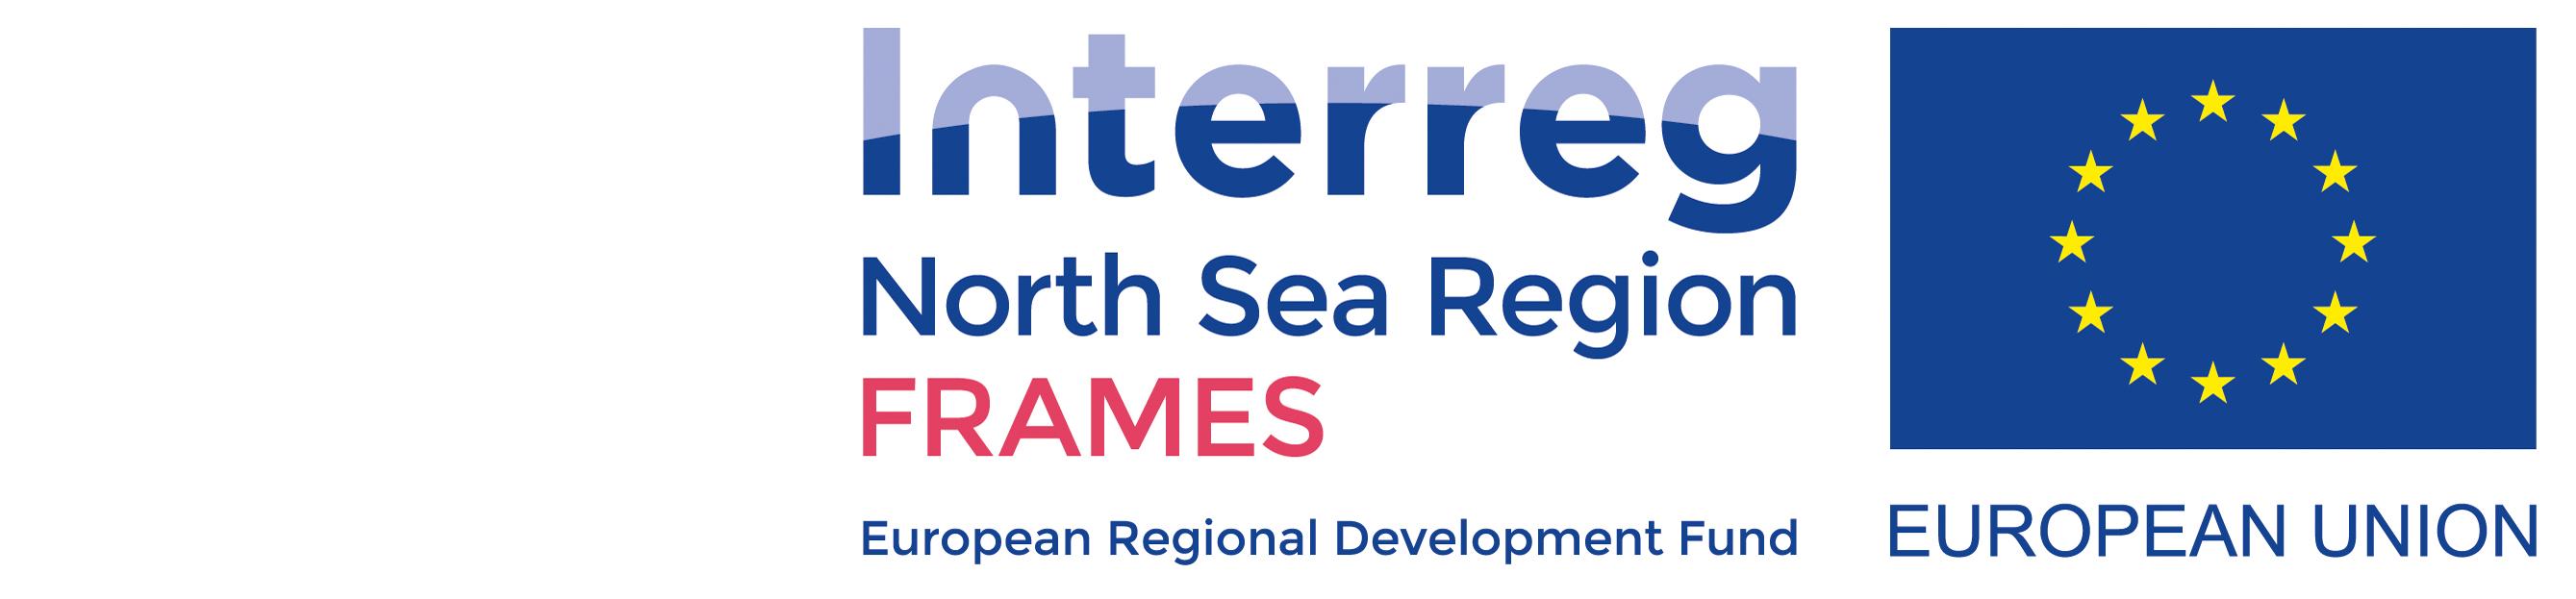 Logo Interreg North Sea Region FRAMES